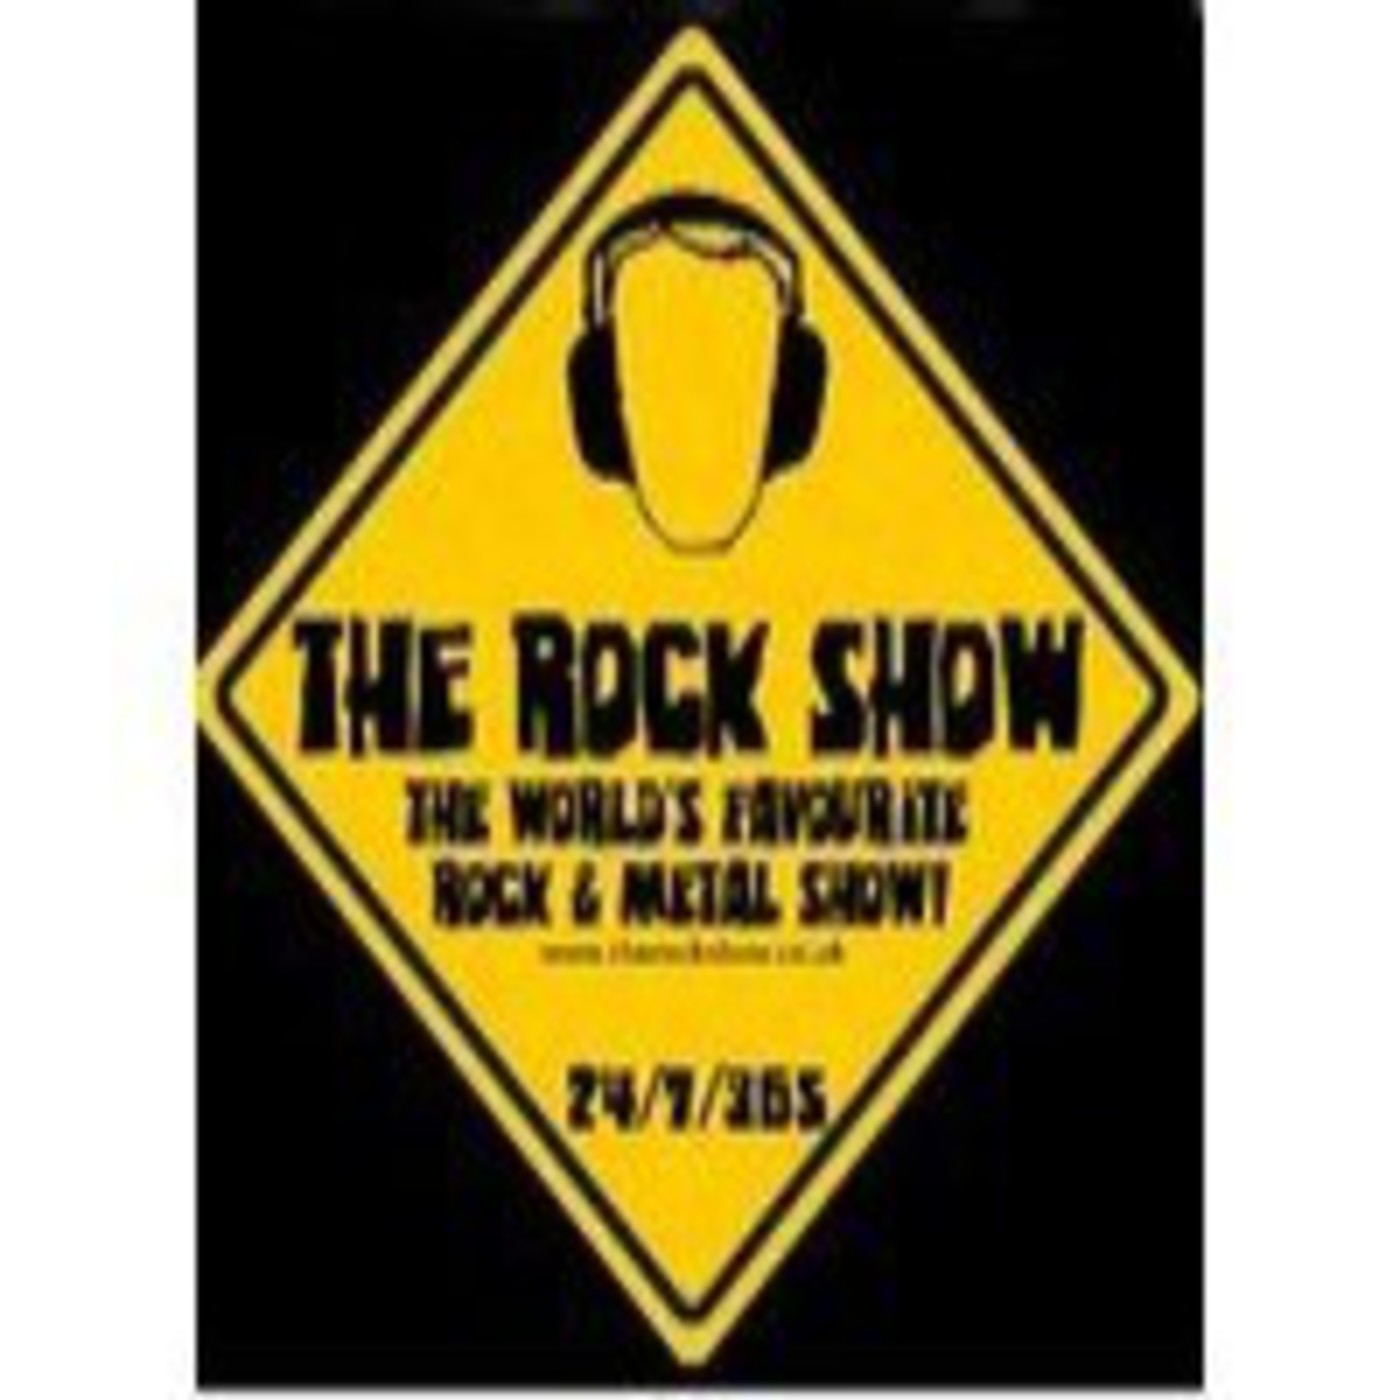 The Rock Show LIVE! - 11 November 2013